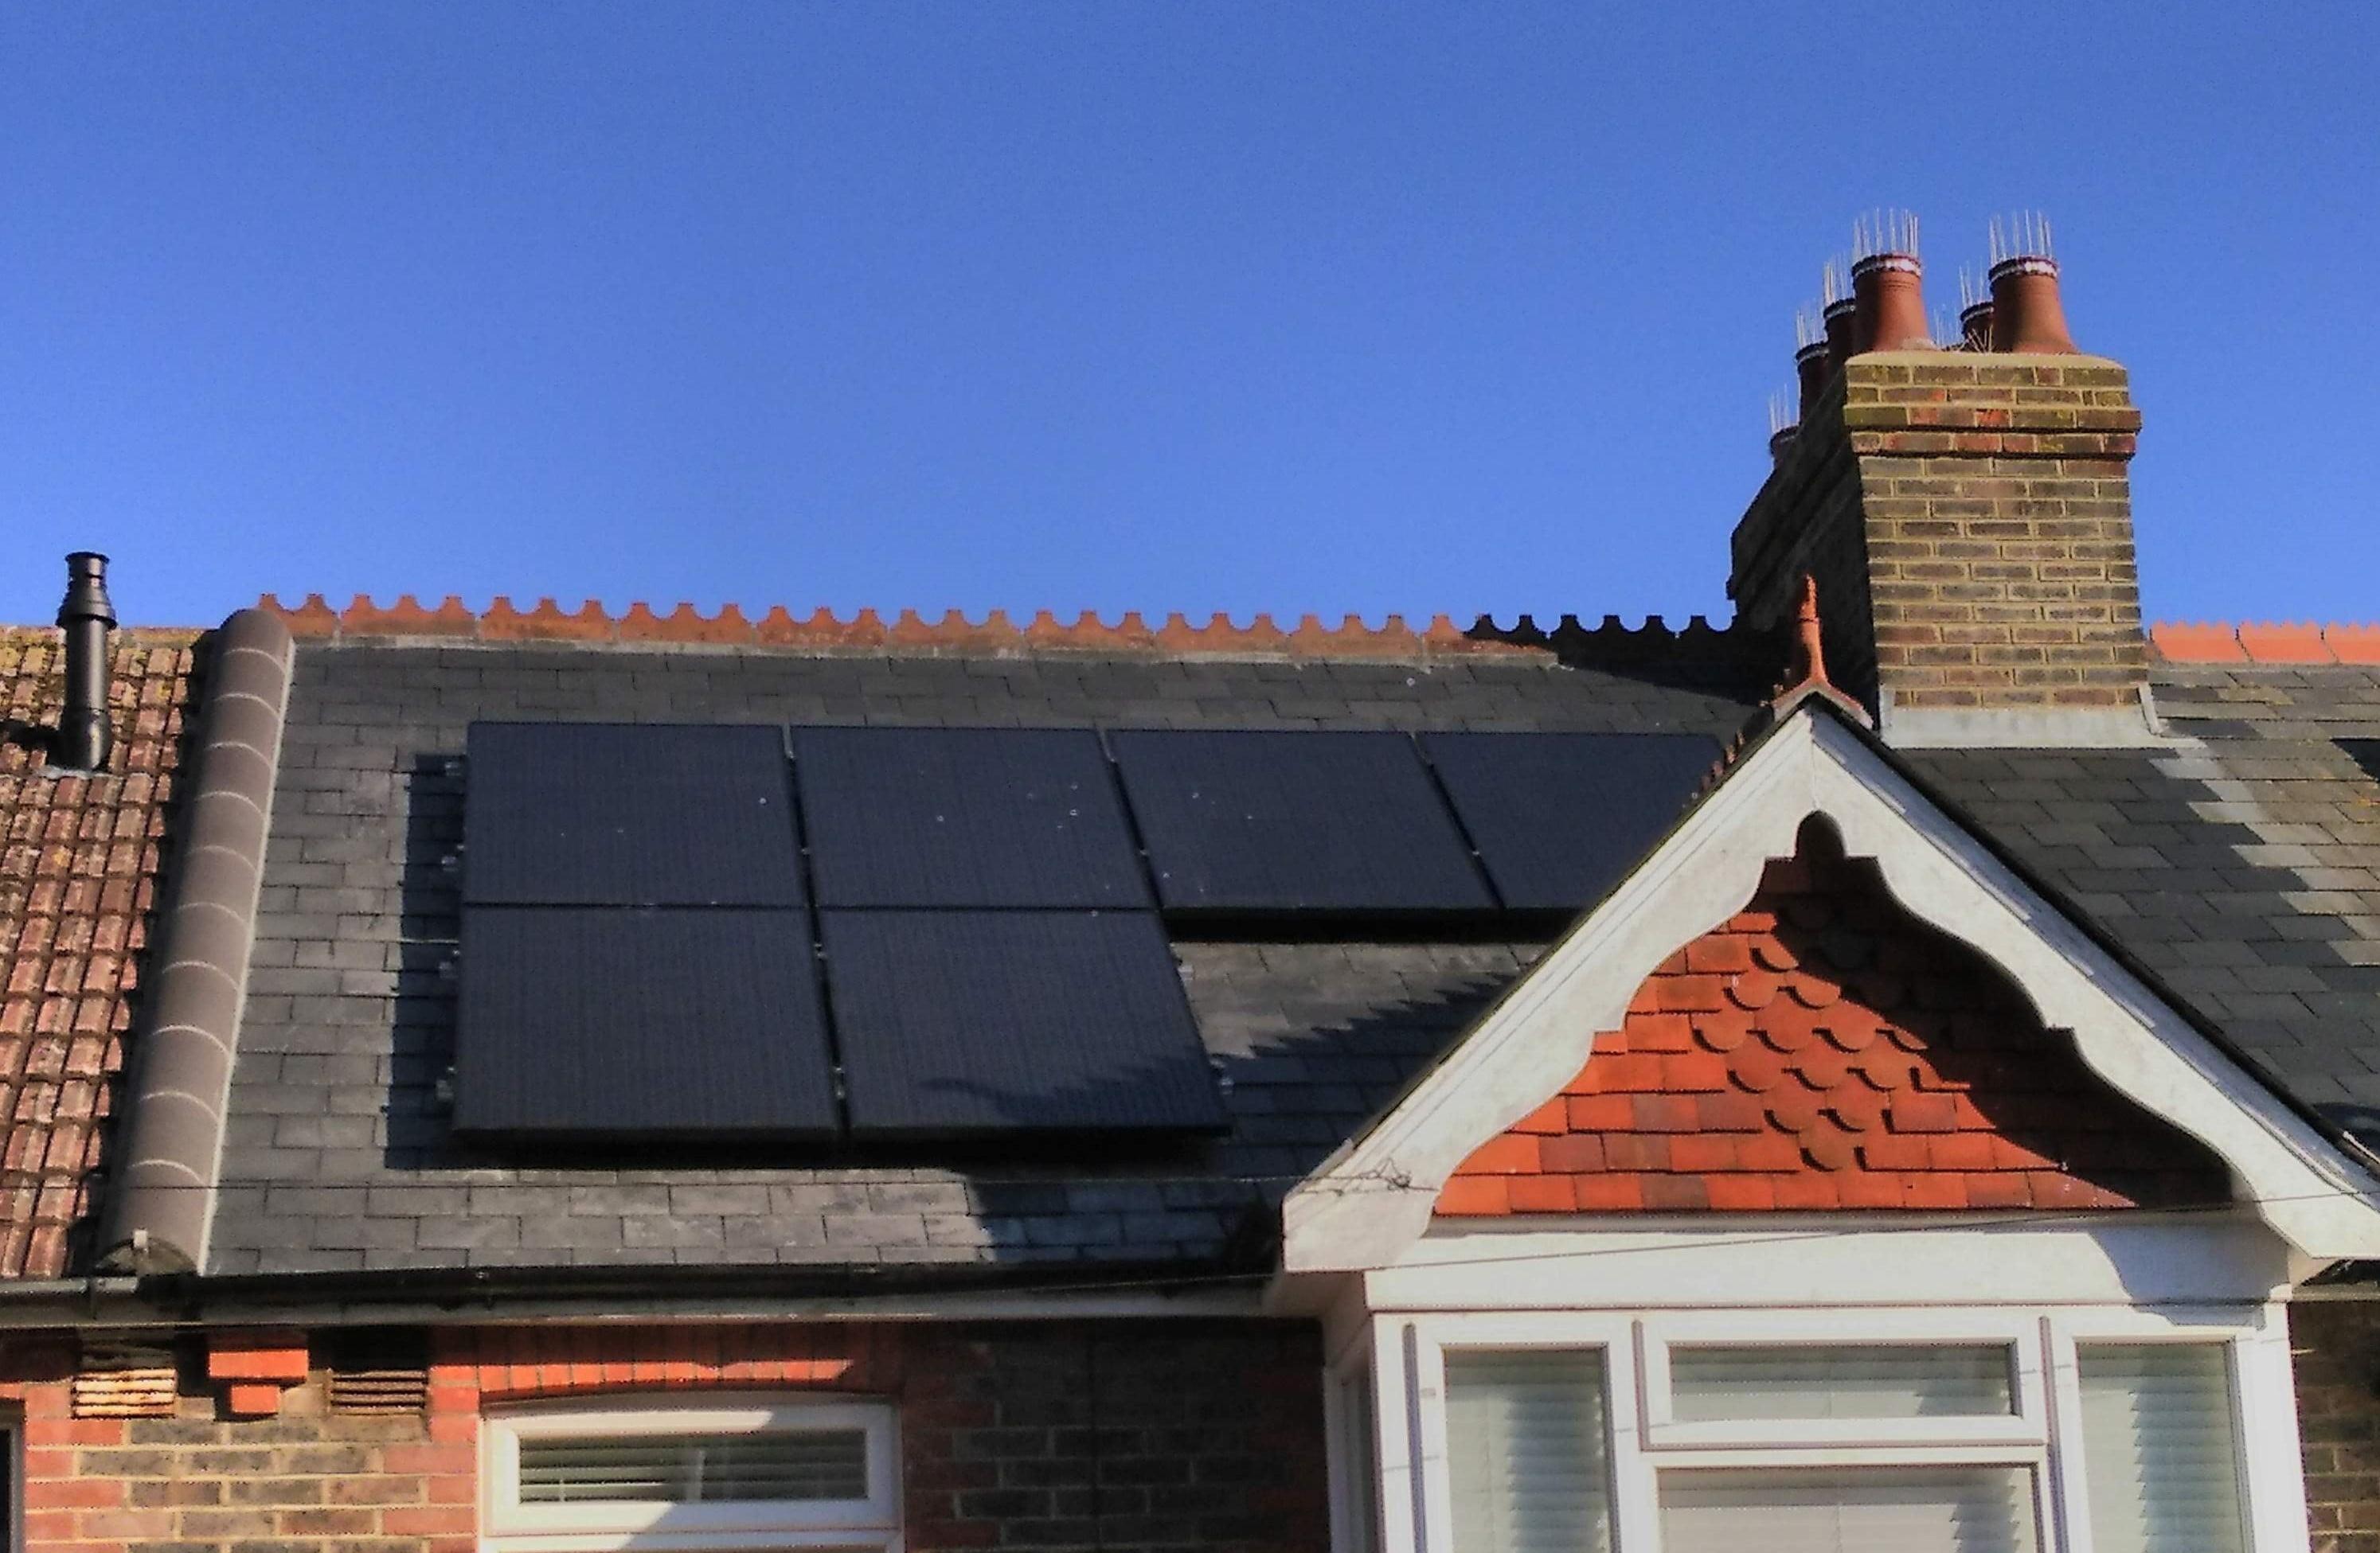 domestic rooftop solar panels battery storage combination brighton hove